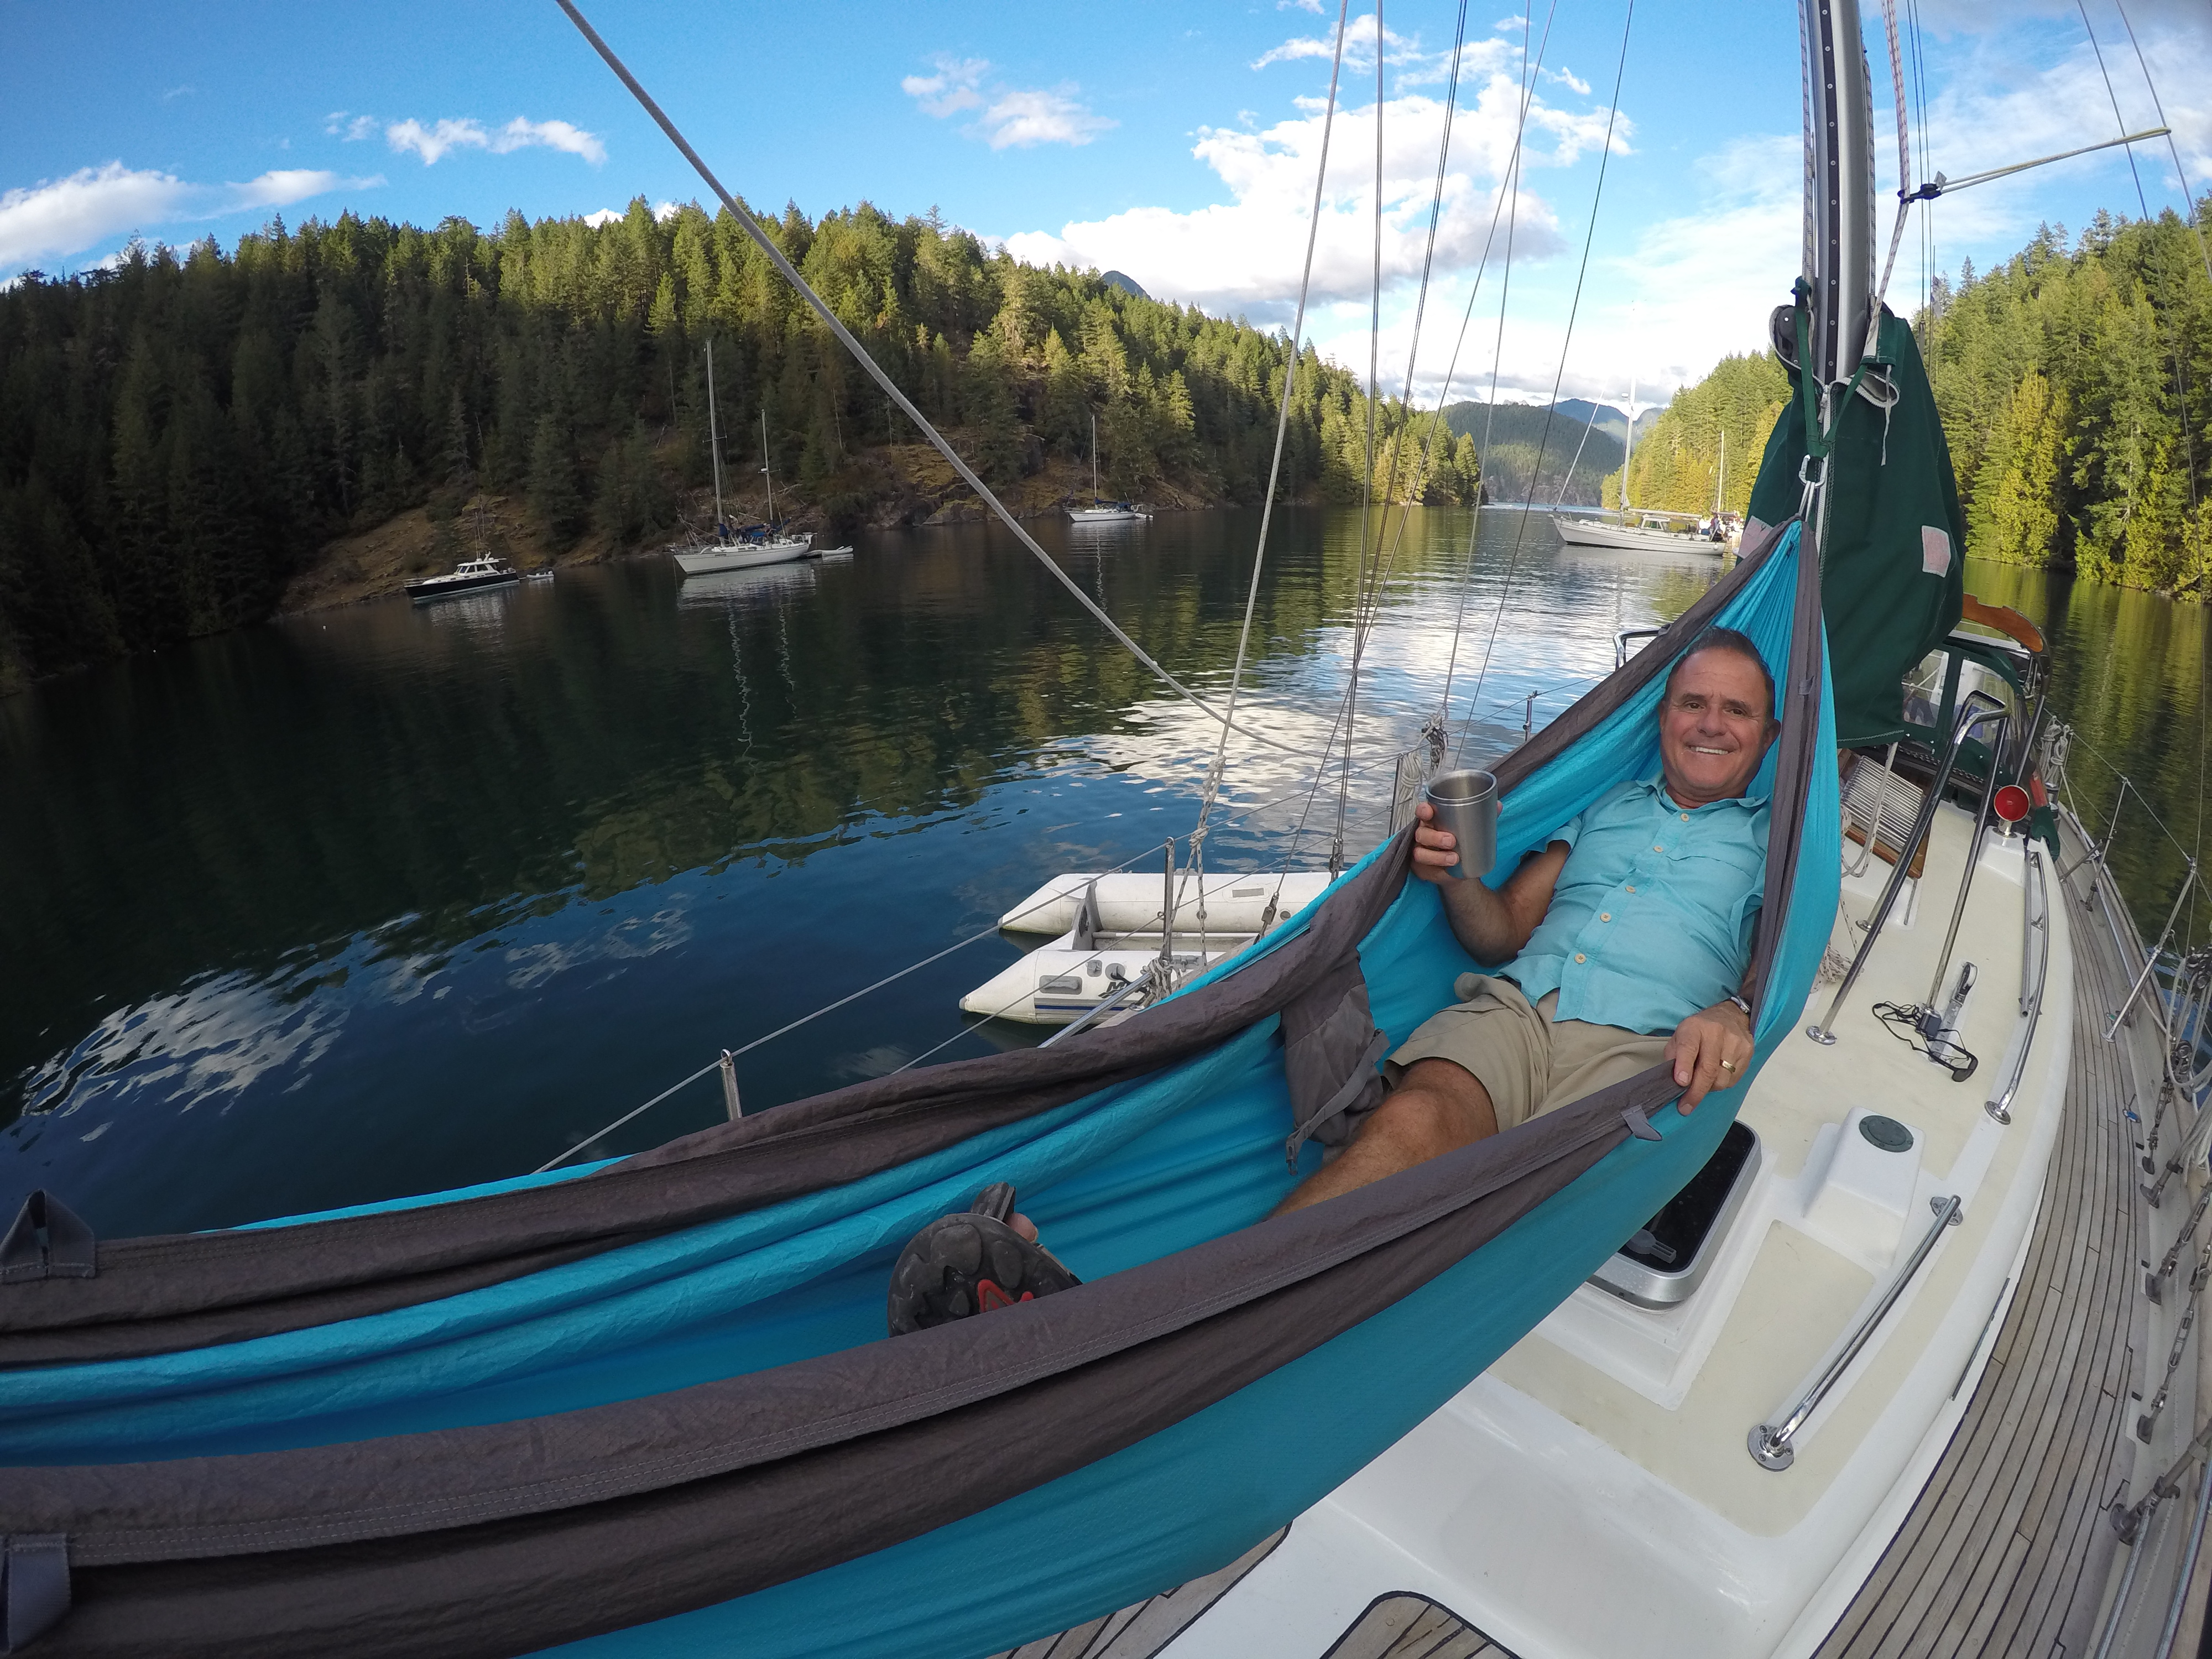 Dad in hammock on Leela sailboat in Desolation Sound